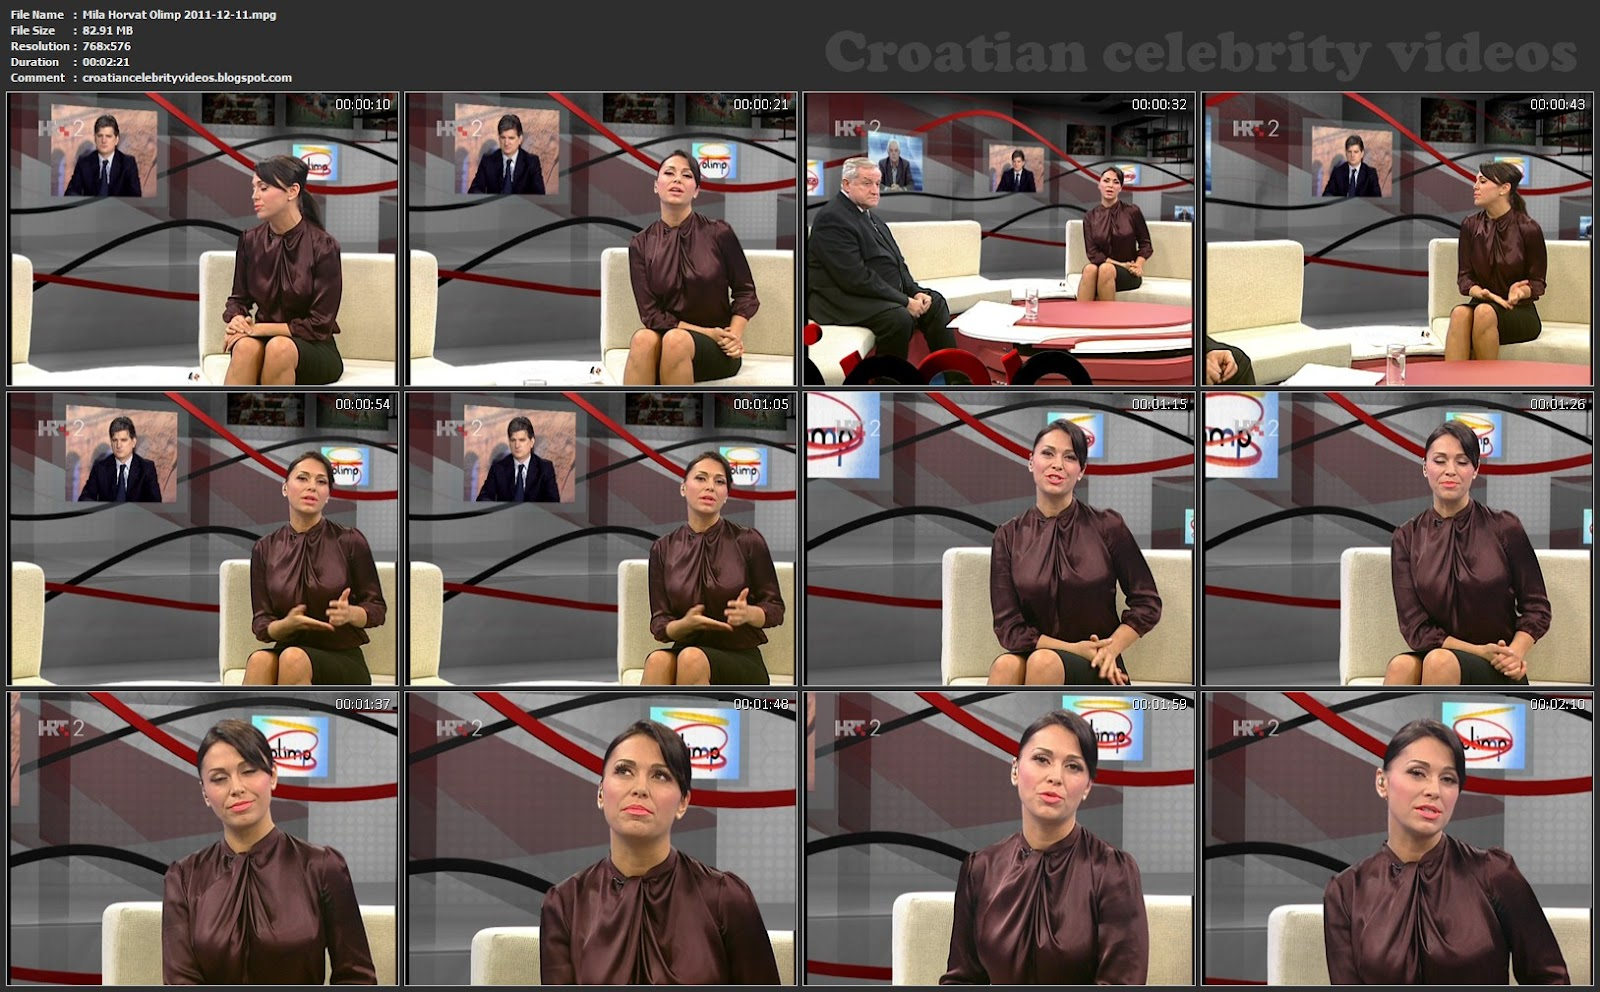 http://2.bp.blogspot.com/-vZK_cJMHOBY/TuTVLasOD9I/AAAAAAAABHM/6qOQc15BMCg/s1600/Mila+Horvat+Olimp+2011-12-11.mpg.jpg